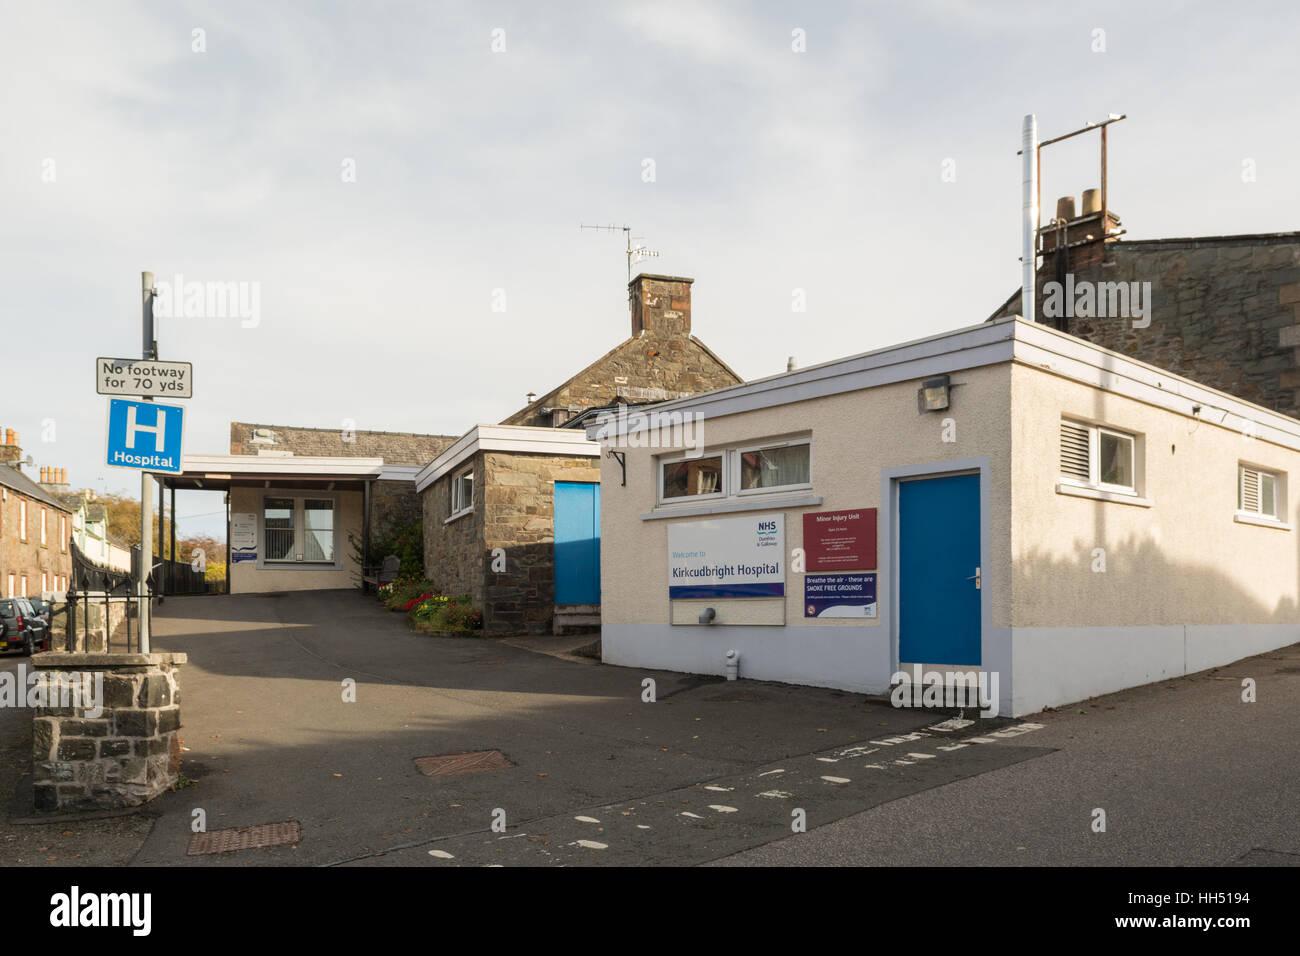 Kirkcudbright community hospital, Barrhill Road, Townend, Kirkcudbright, Dumfries and Galloway, Scotland, UK - Stock Image